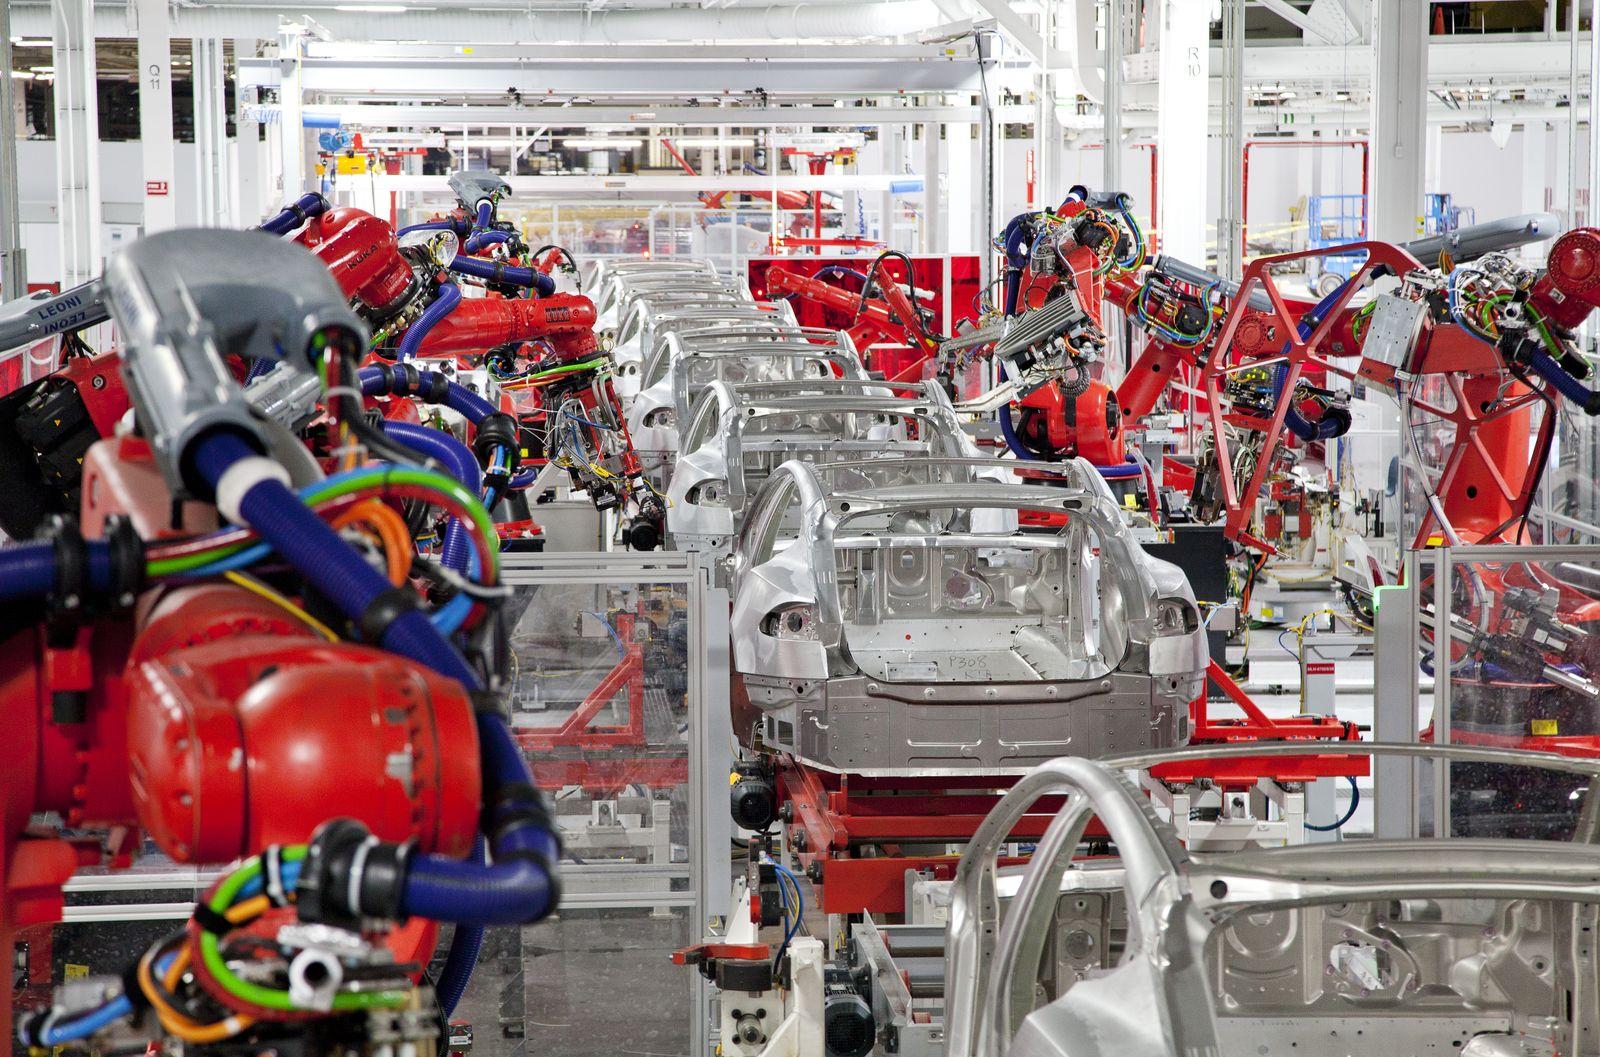 Robotics and human labor assembling Tesla vehicles.